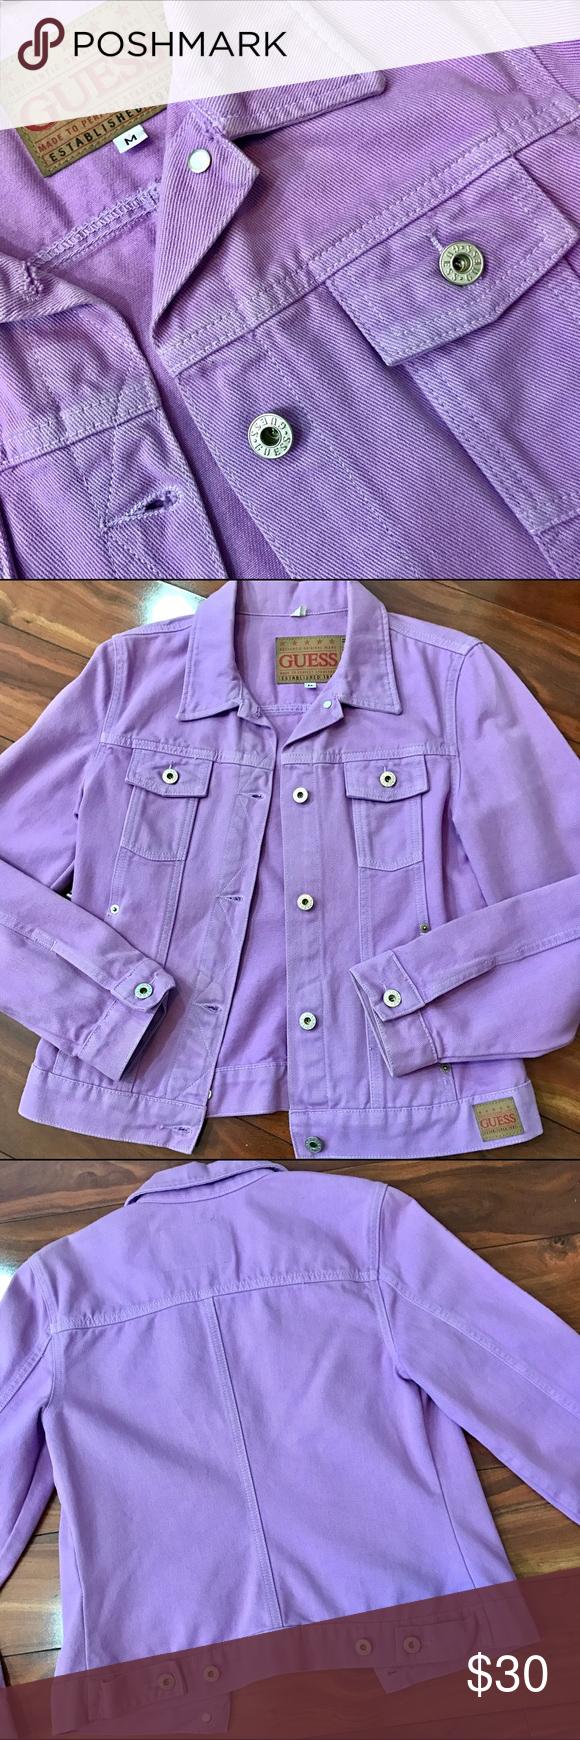 Lavender Denim Jacket Jackets Denim Jacket Denim [ 1740 x 580 Pixel ]